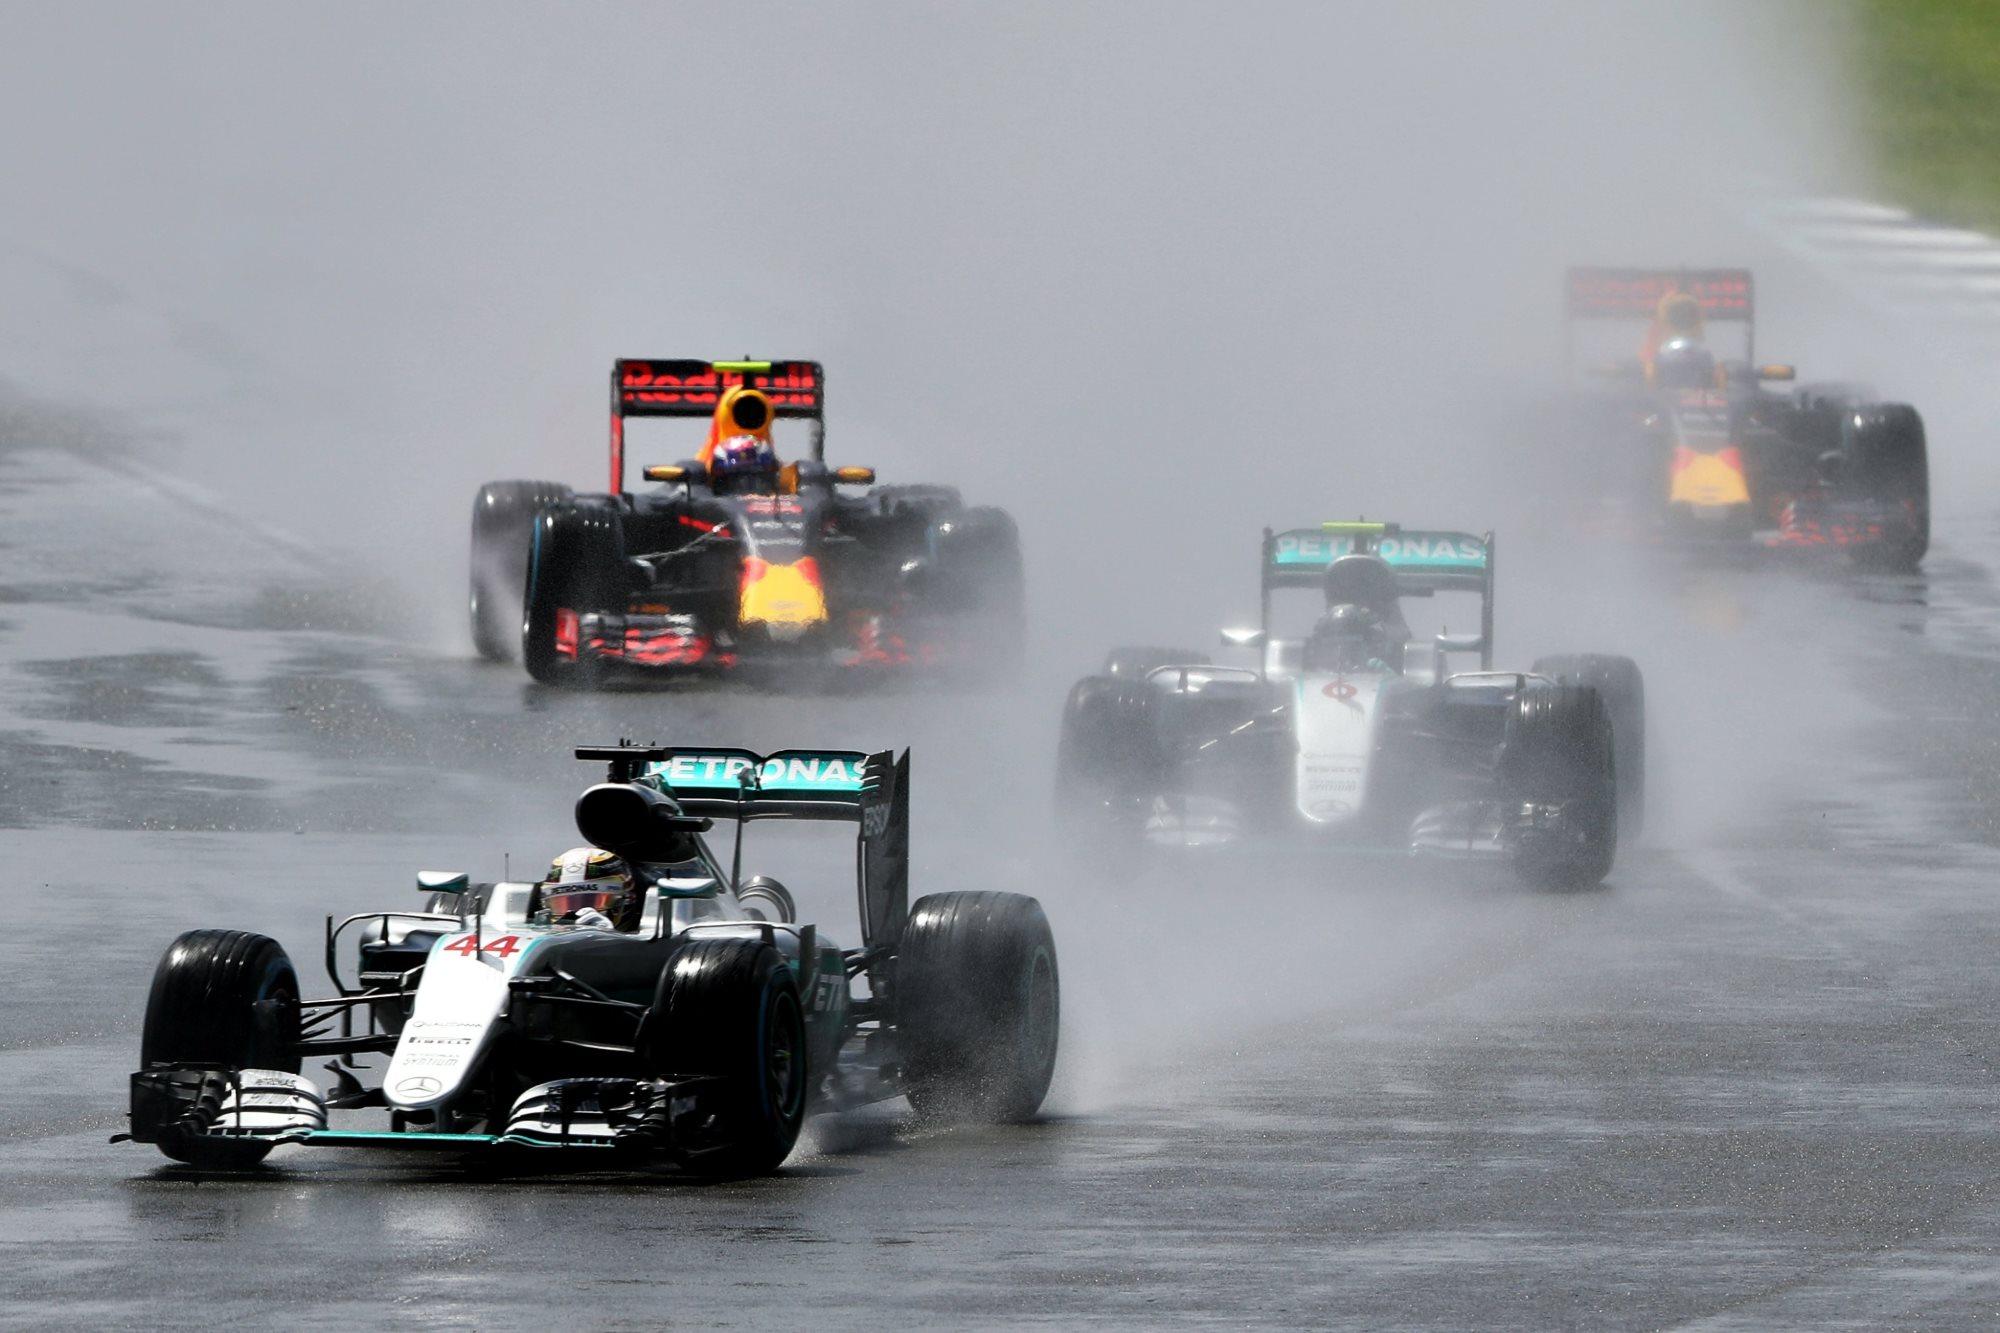 Hamilton Rosberg Verstappen Ricciardo British GP F1 2016 in the wet Foto Red Bull